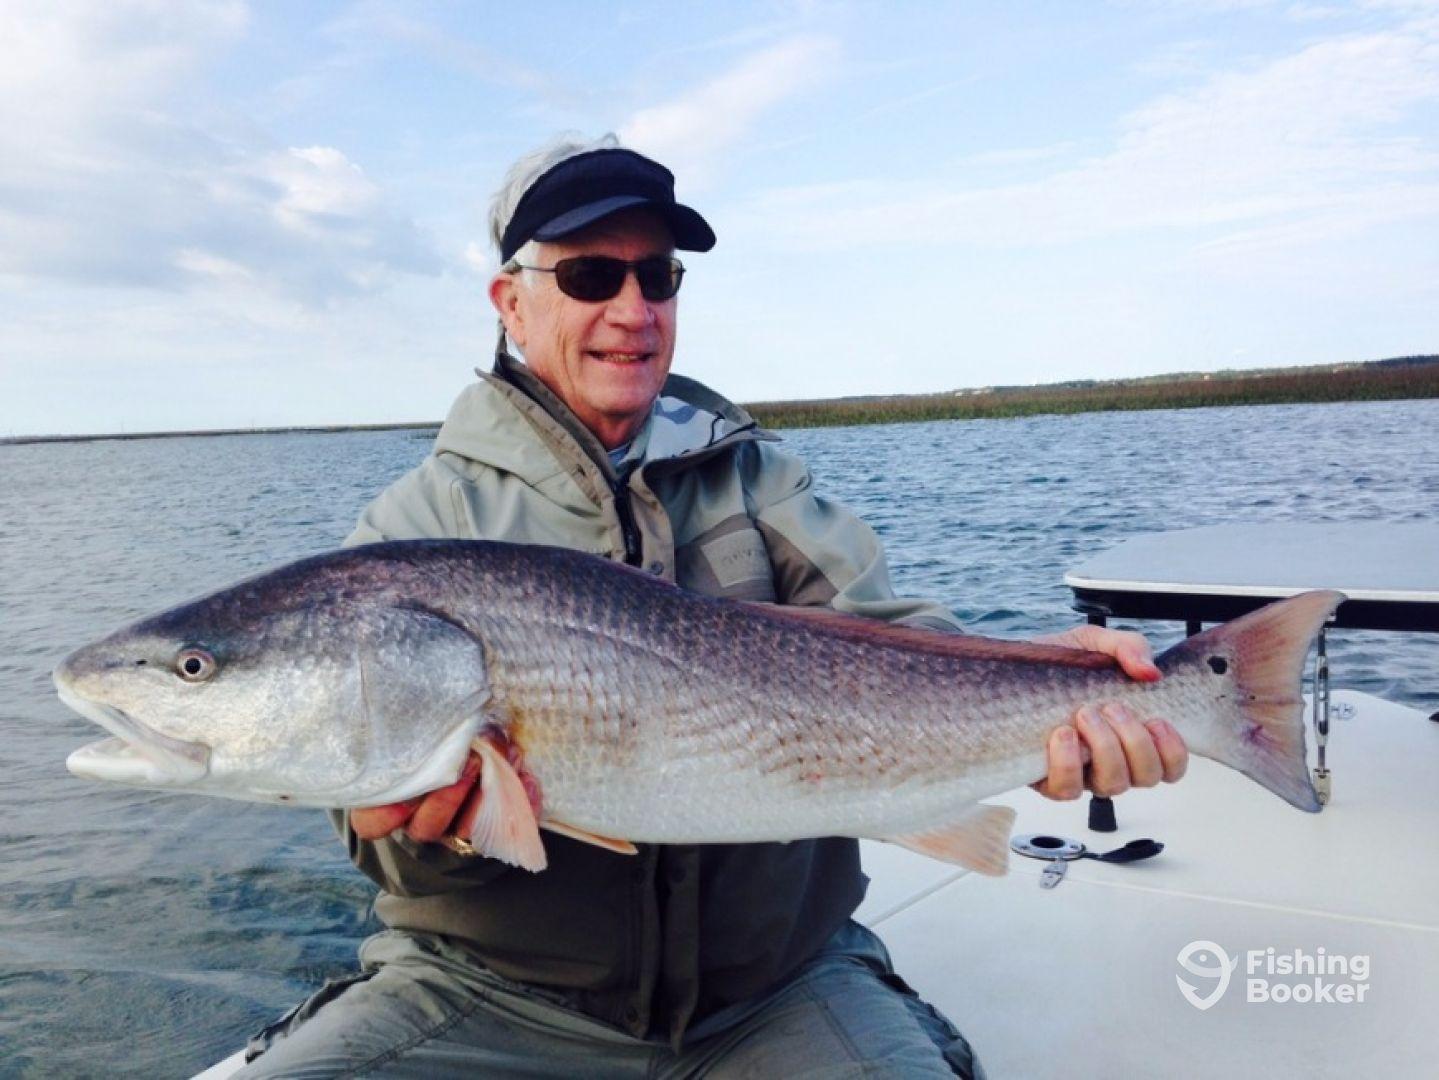 Lighter Breeze Charters Isle Of Palms Sc Fishingbooker